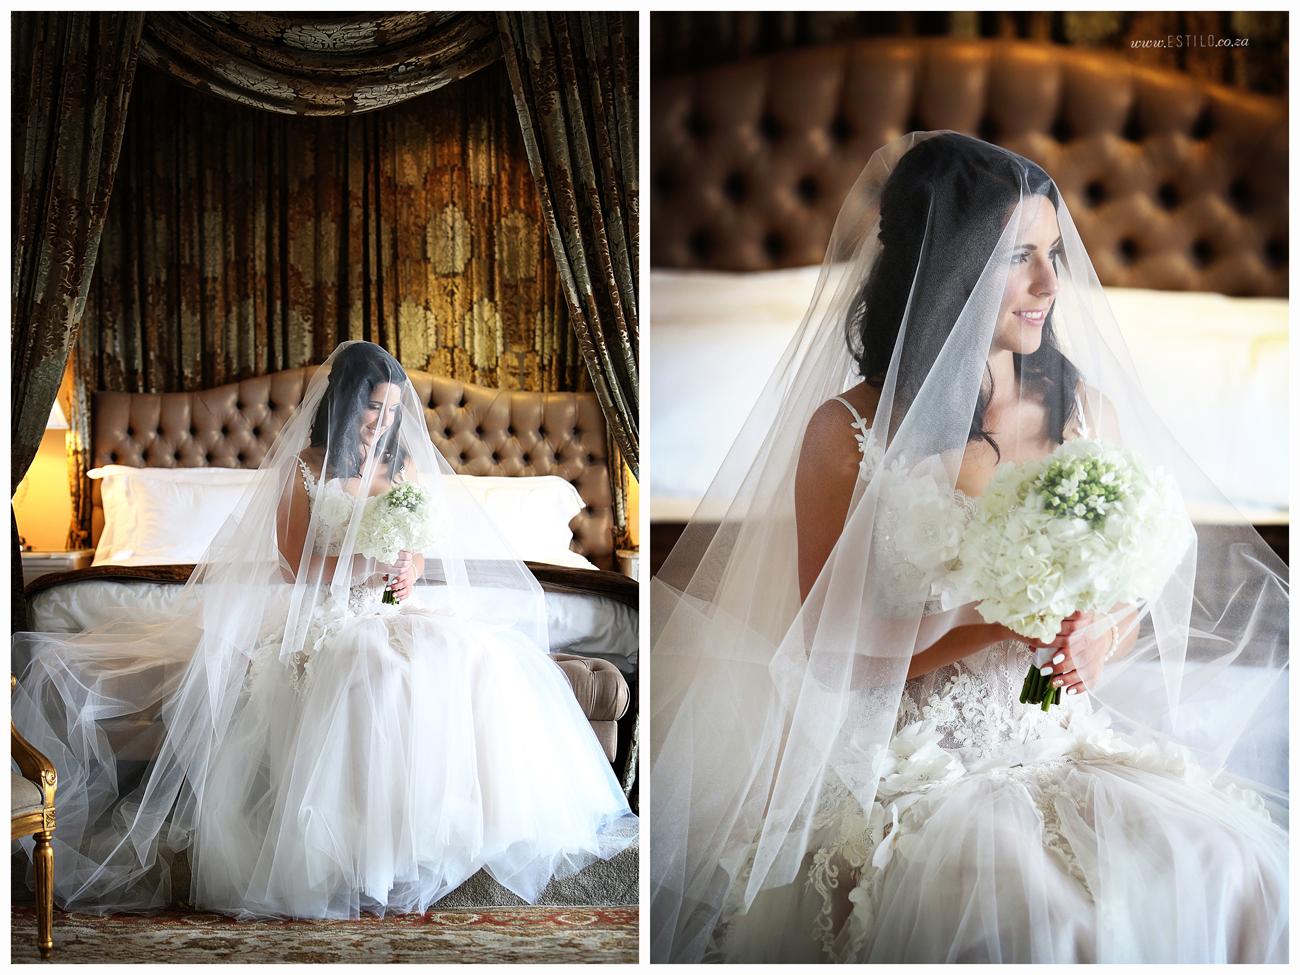 johannesburg-wedding-photographers-wedding-at-randlords-best-wedding-photographers-south-africa_0029.jpg